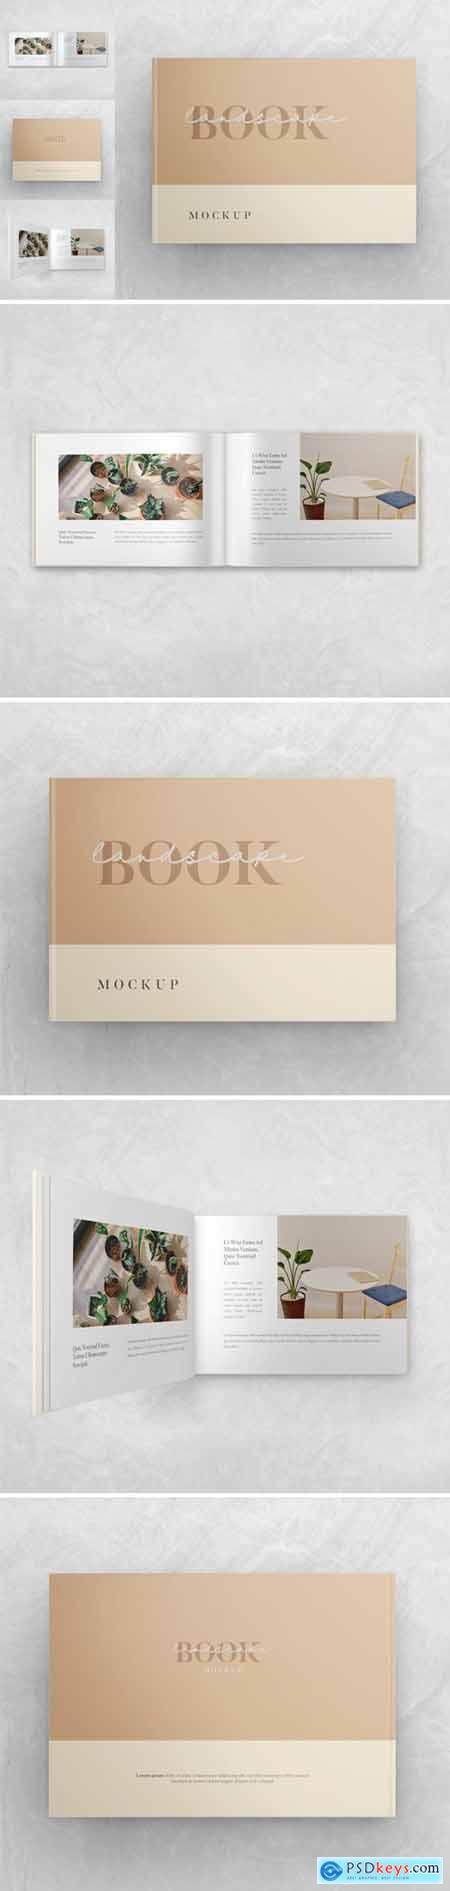 Landscape Book - Mockup Vol.2